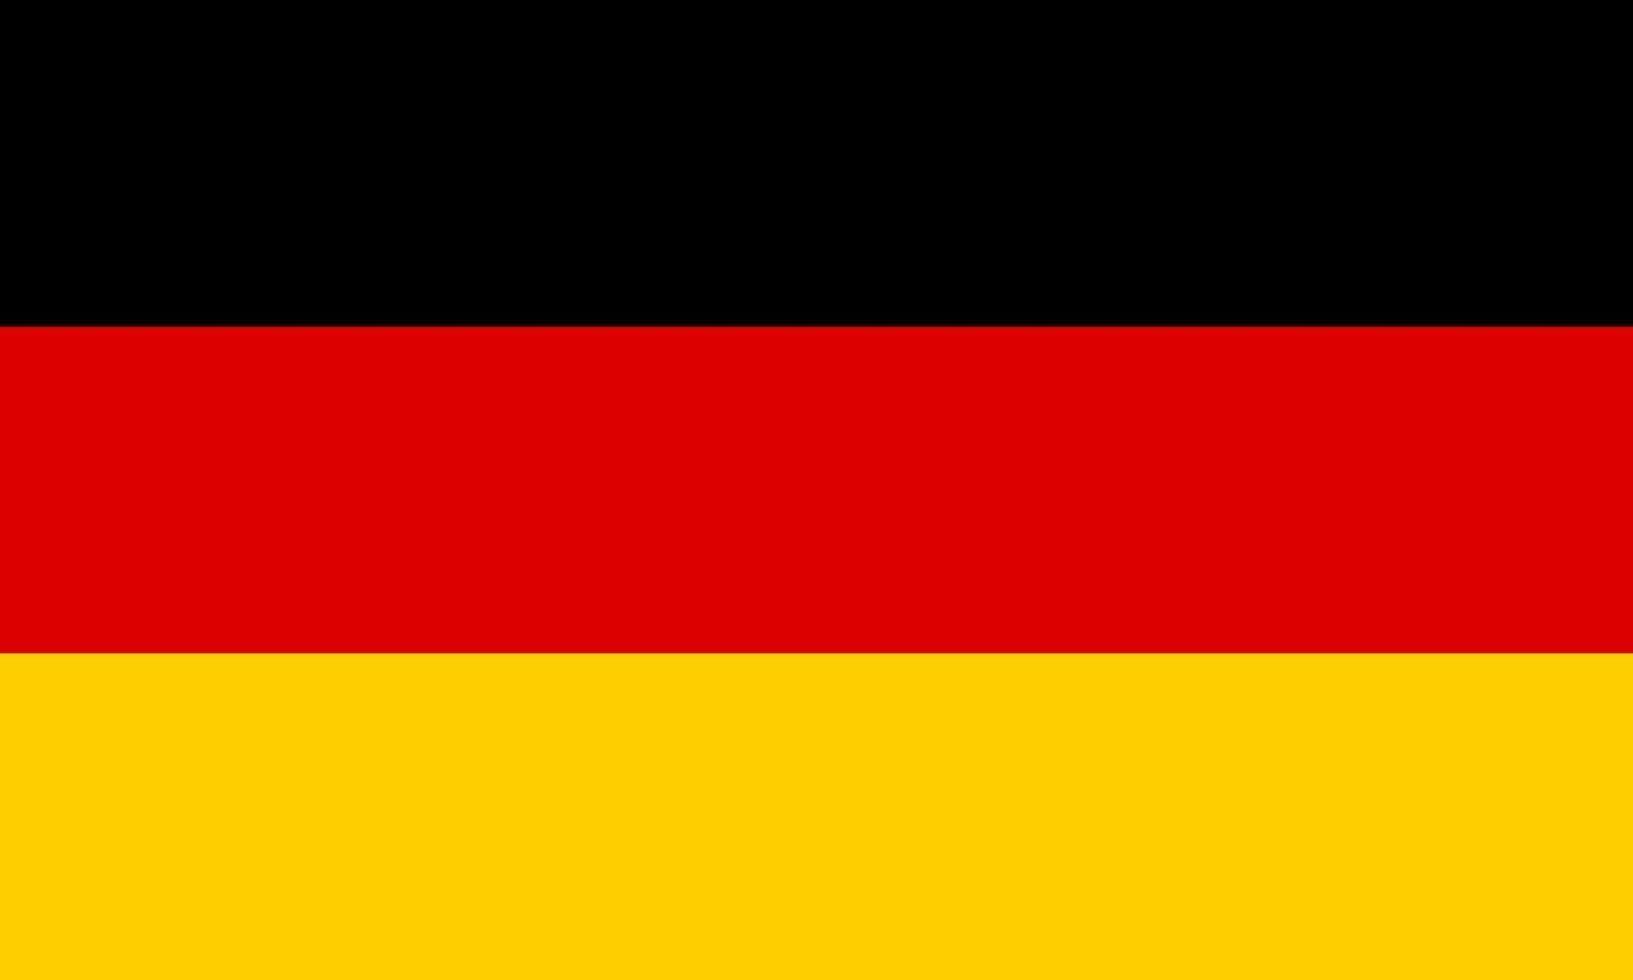 bandeira da República Federal da Alemanha. 1925484 Vetor no Vecteezy